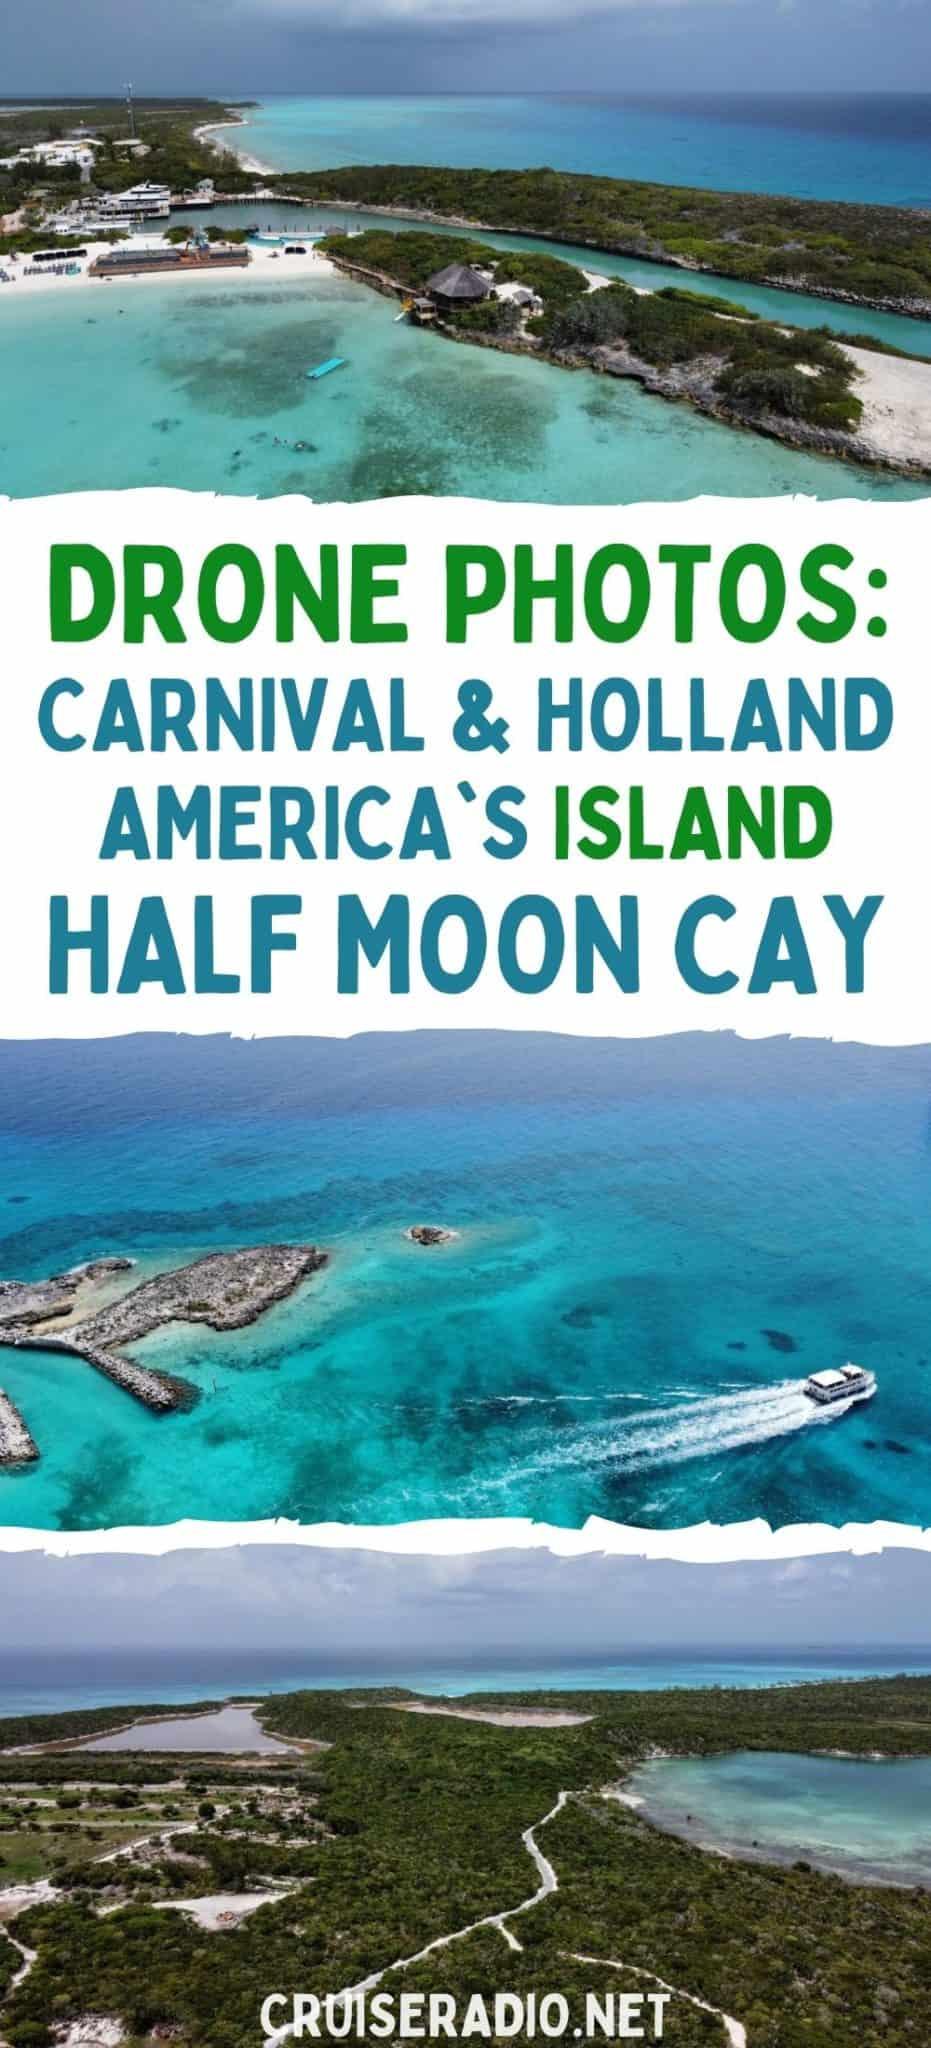 drone photos: carnival and holland america's island half moon cay